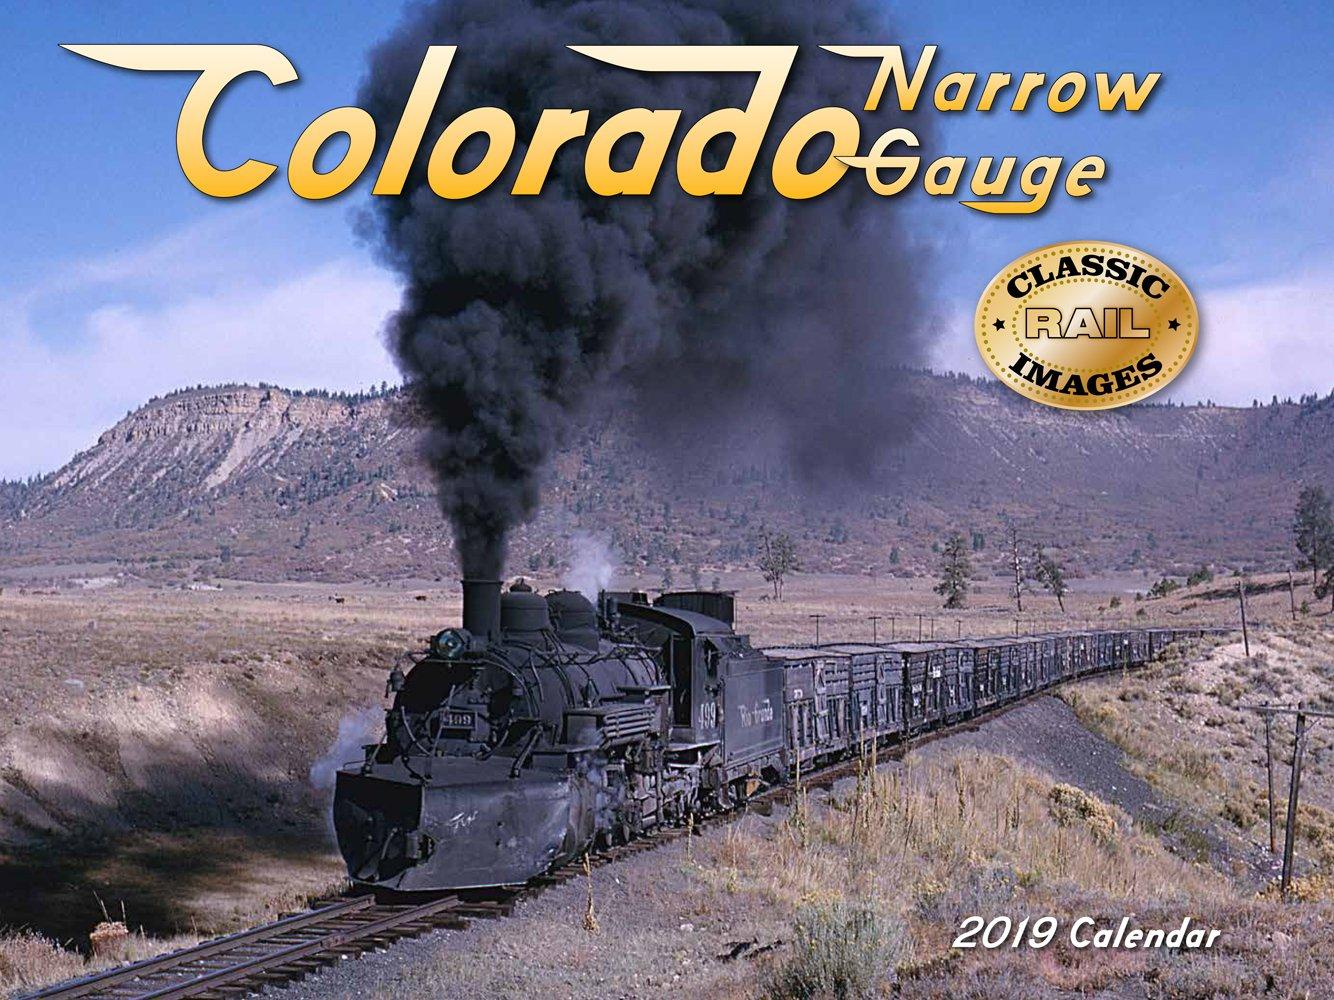 Colorado Narrow Gauge 2019 Calendar by Tide-Mark Pr Ltd